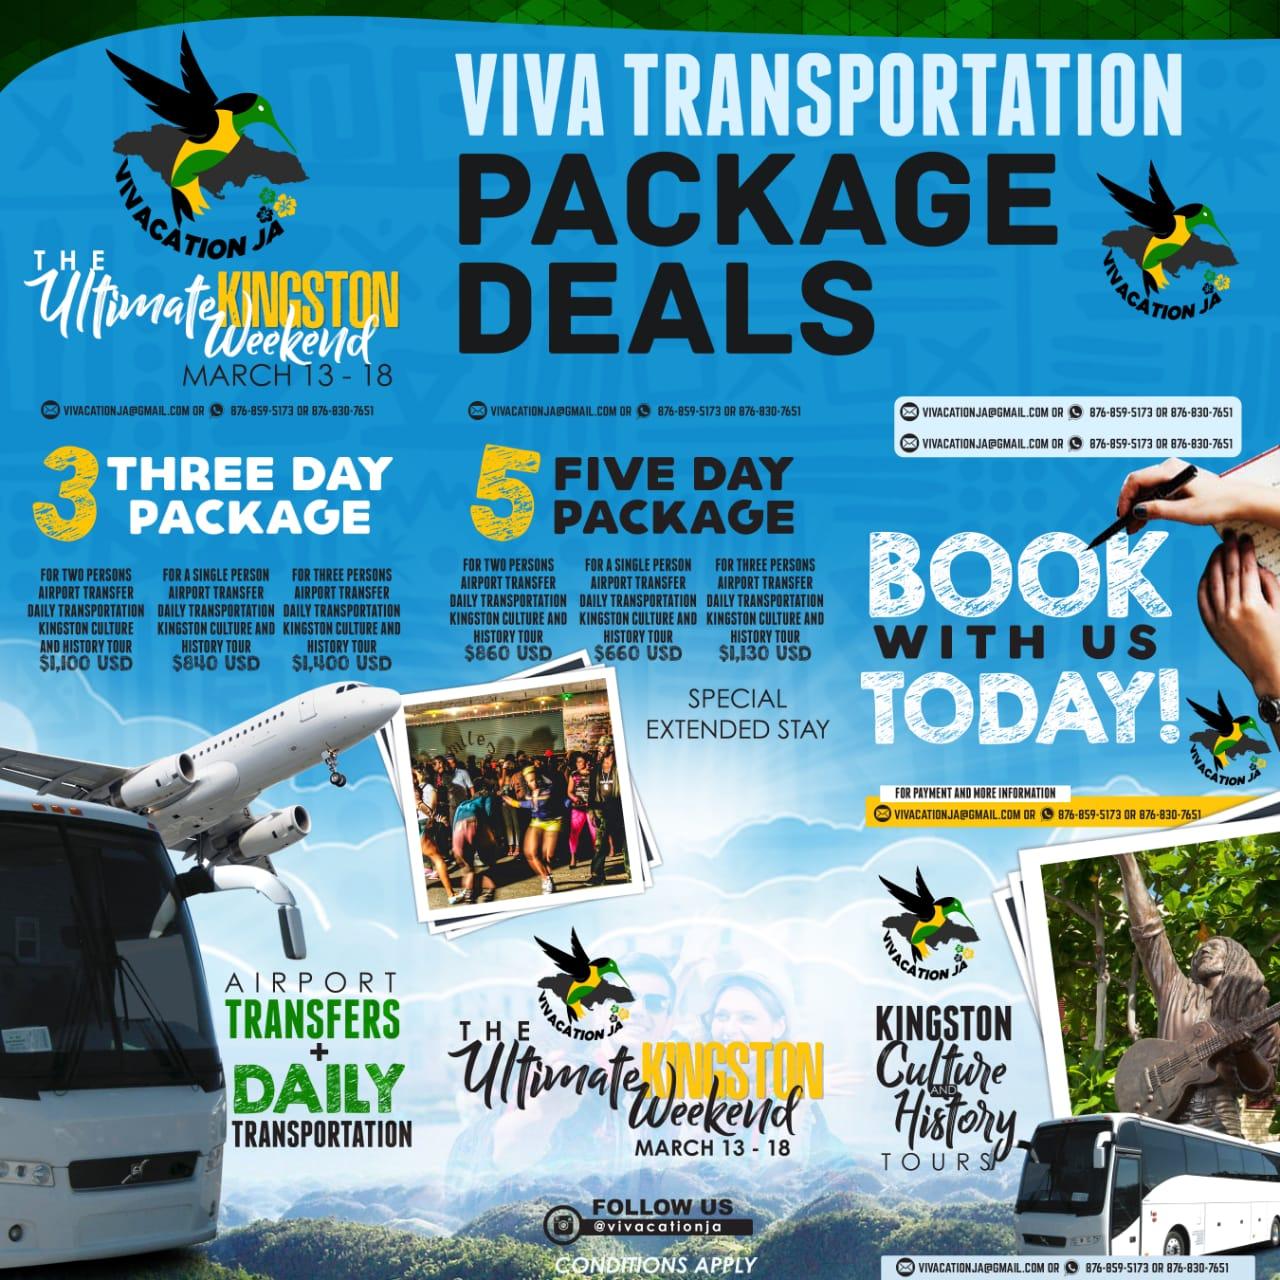 BUJU BANTON EVENTS - Local Transportation